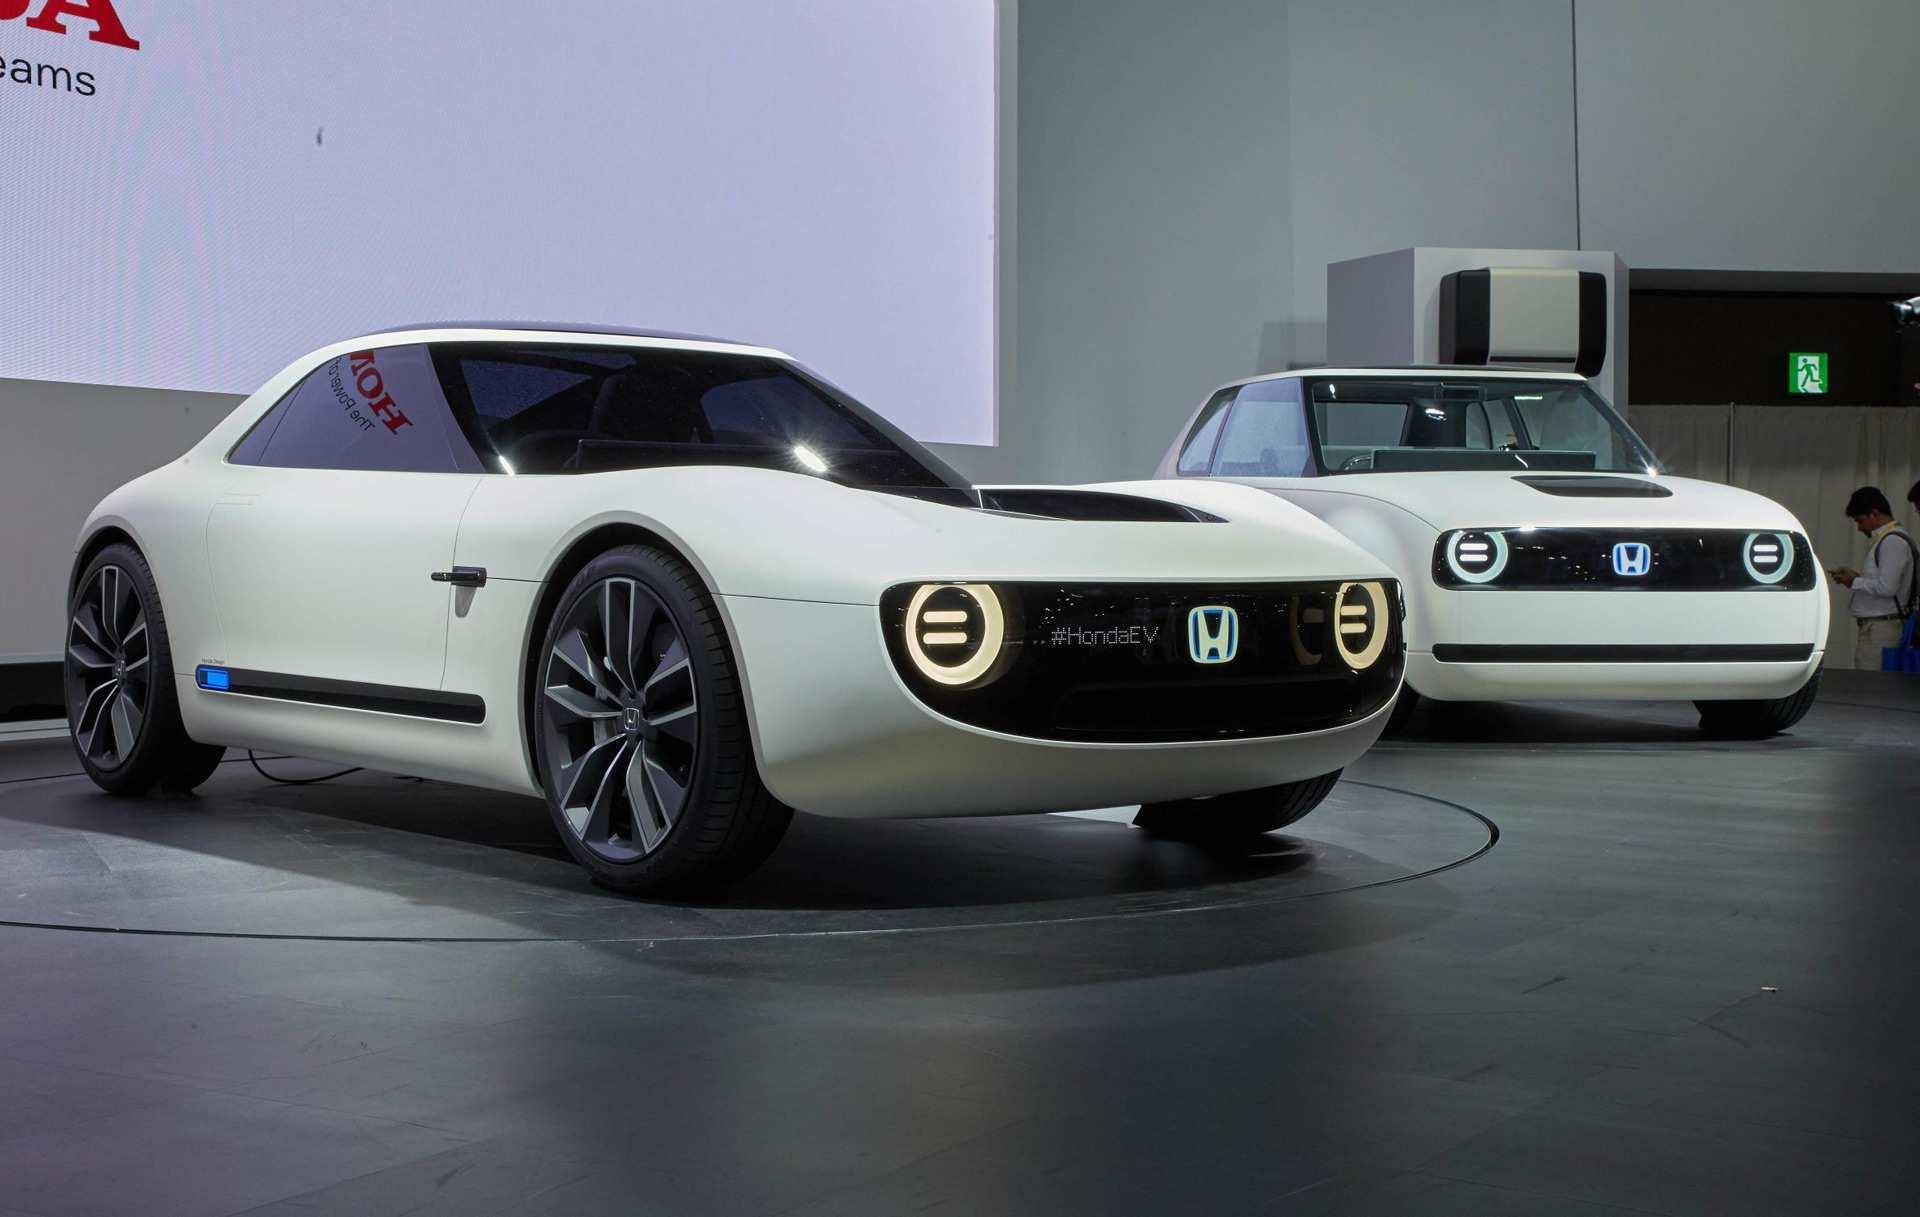 24 Concept of Honda 2020 Vision Specs by Honda 2020 Vision